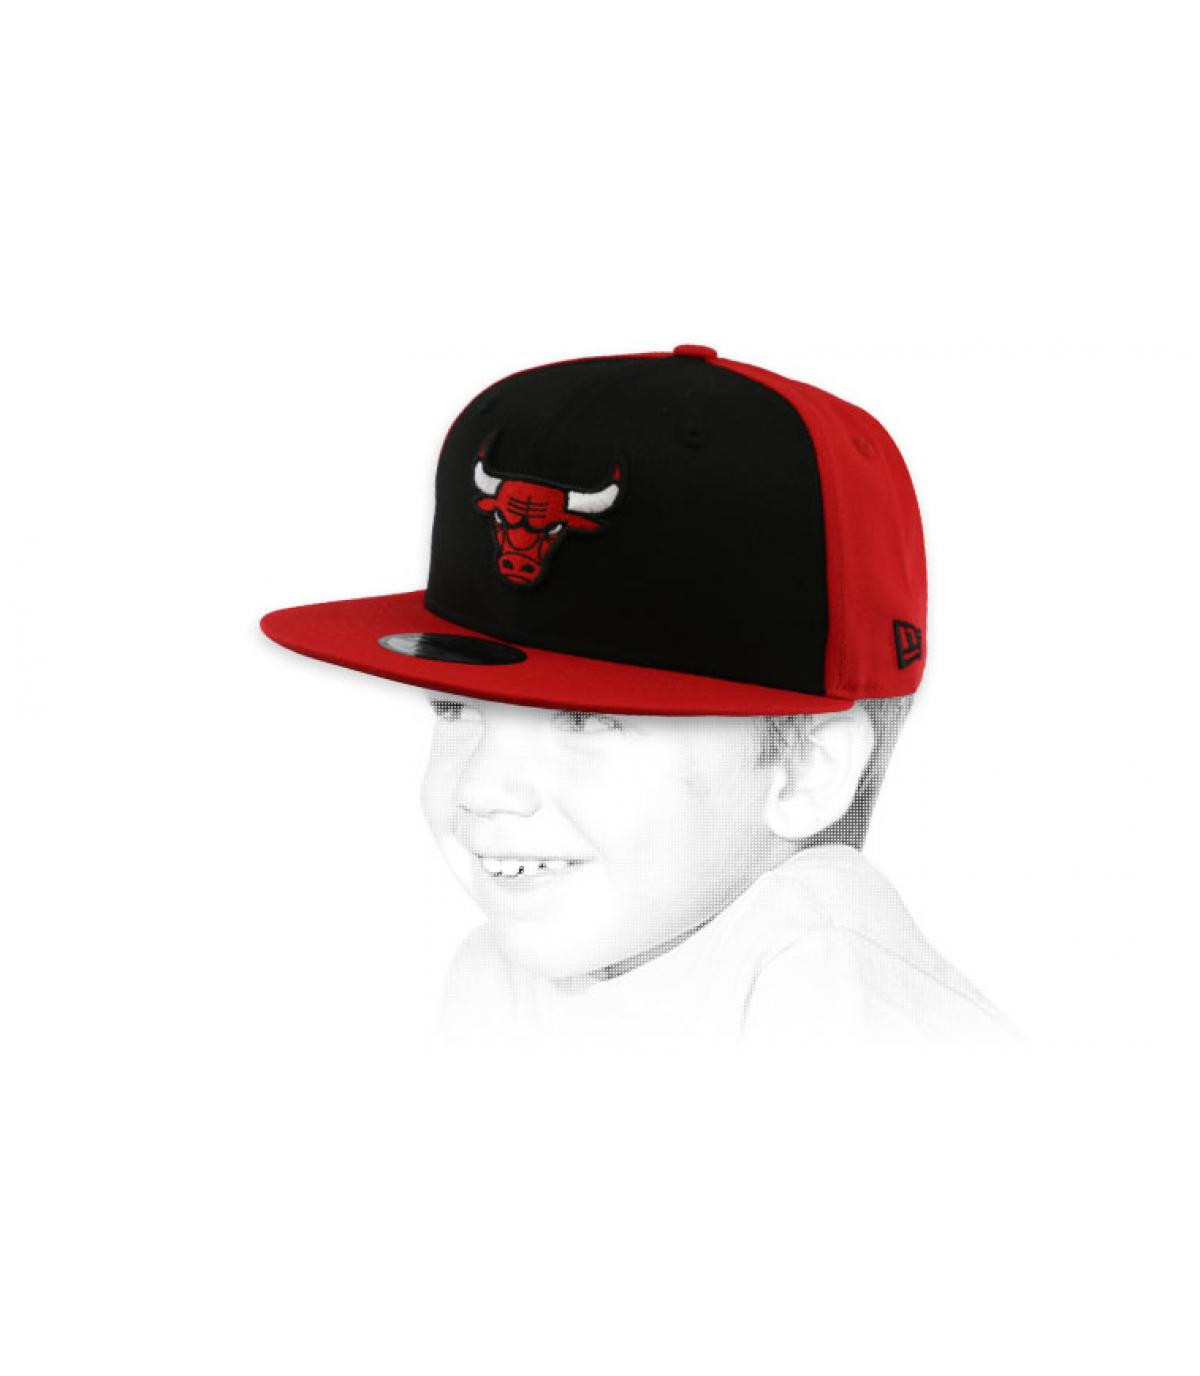 Bulls snapback red black